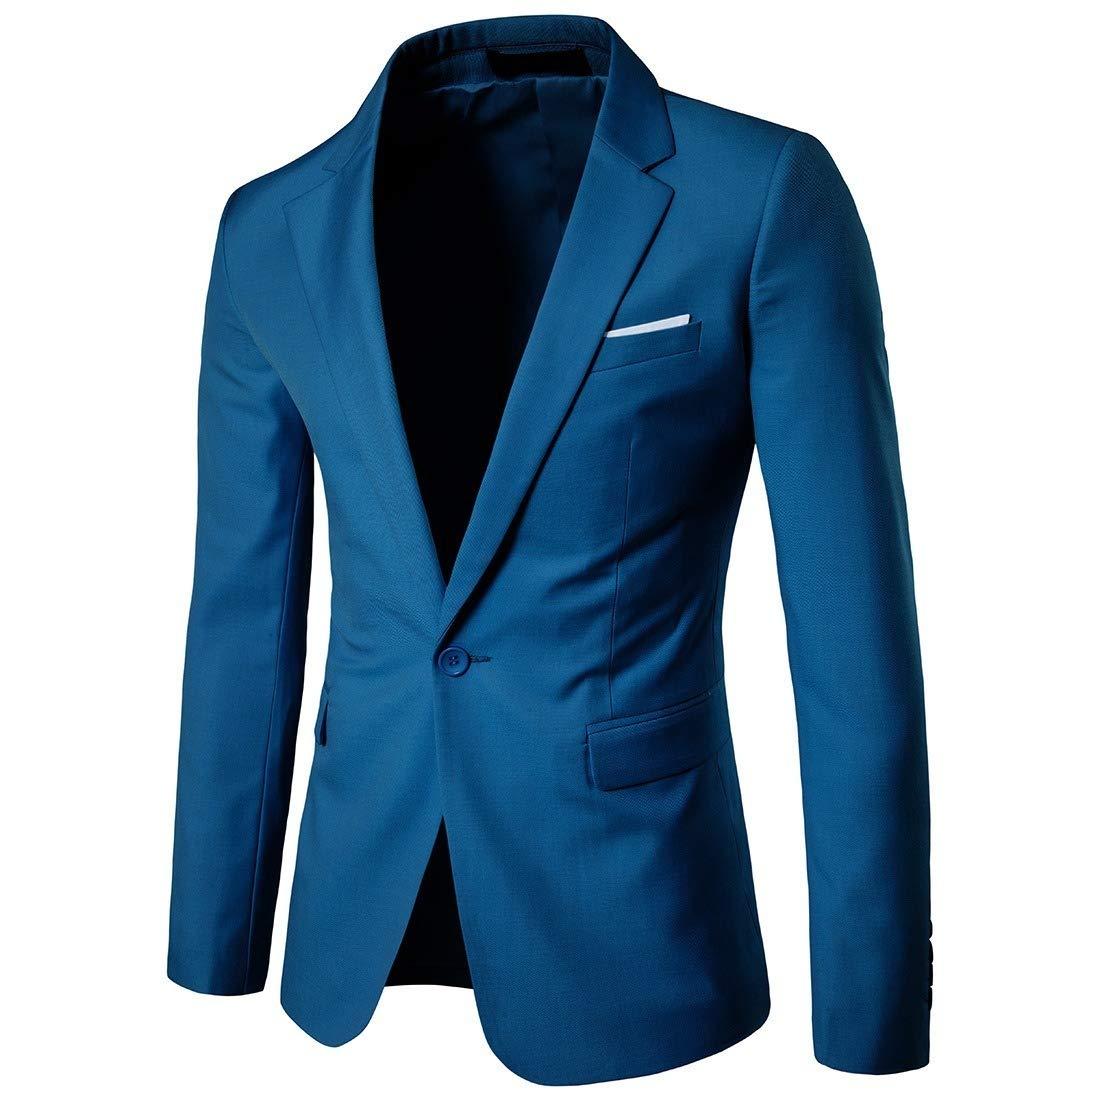 AS1 ROHEP Mens Jackets Relaxed Jacket Coat Notch Lapel Blazer Sport Coat